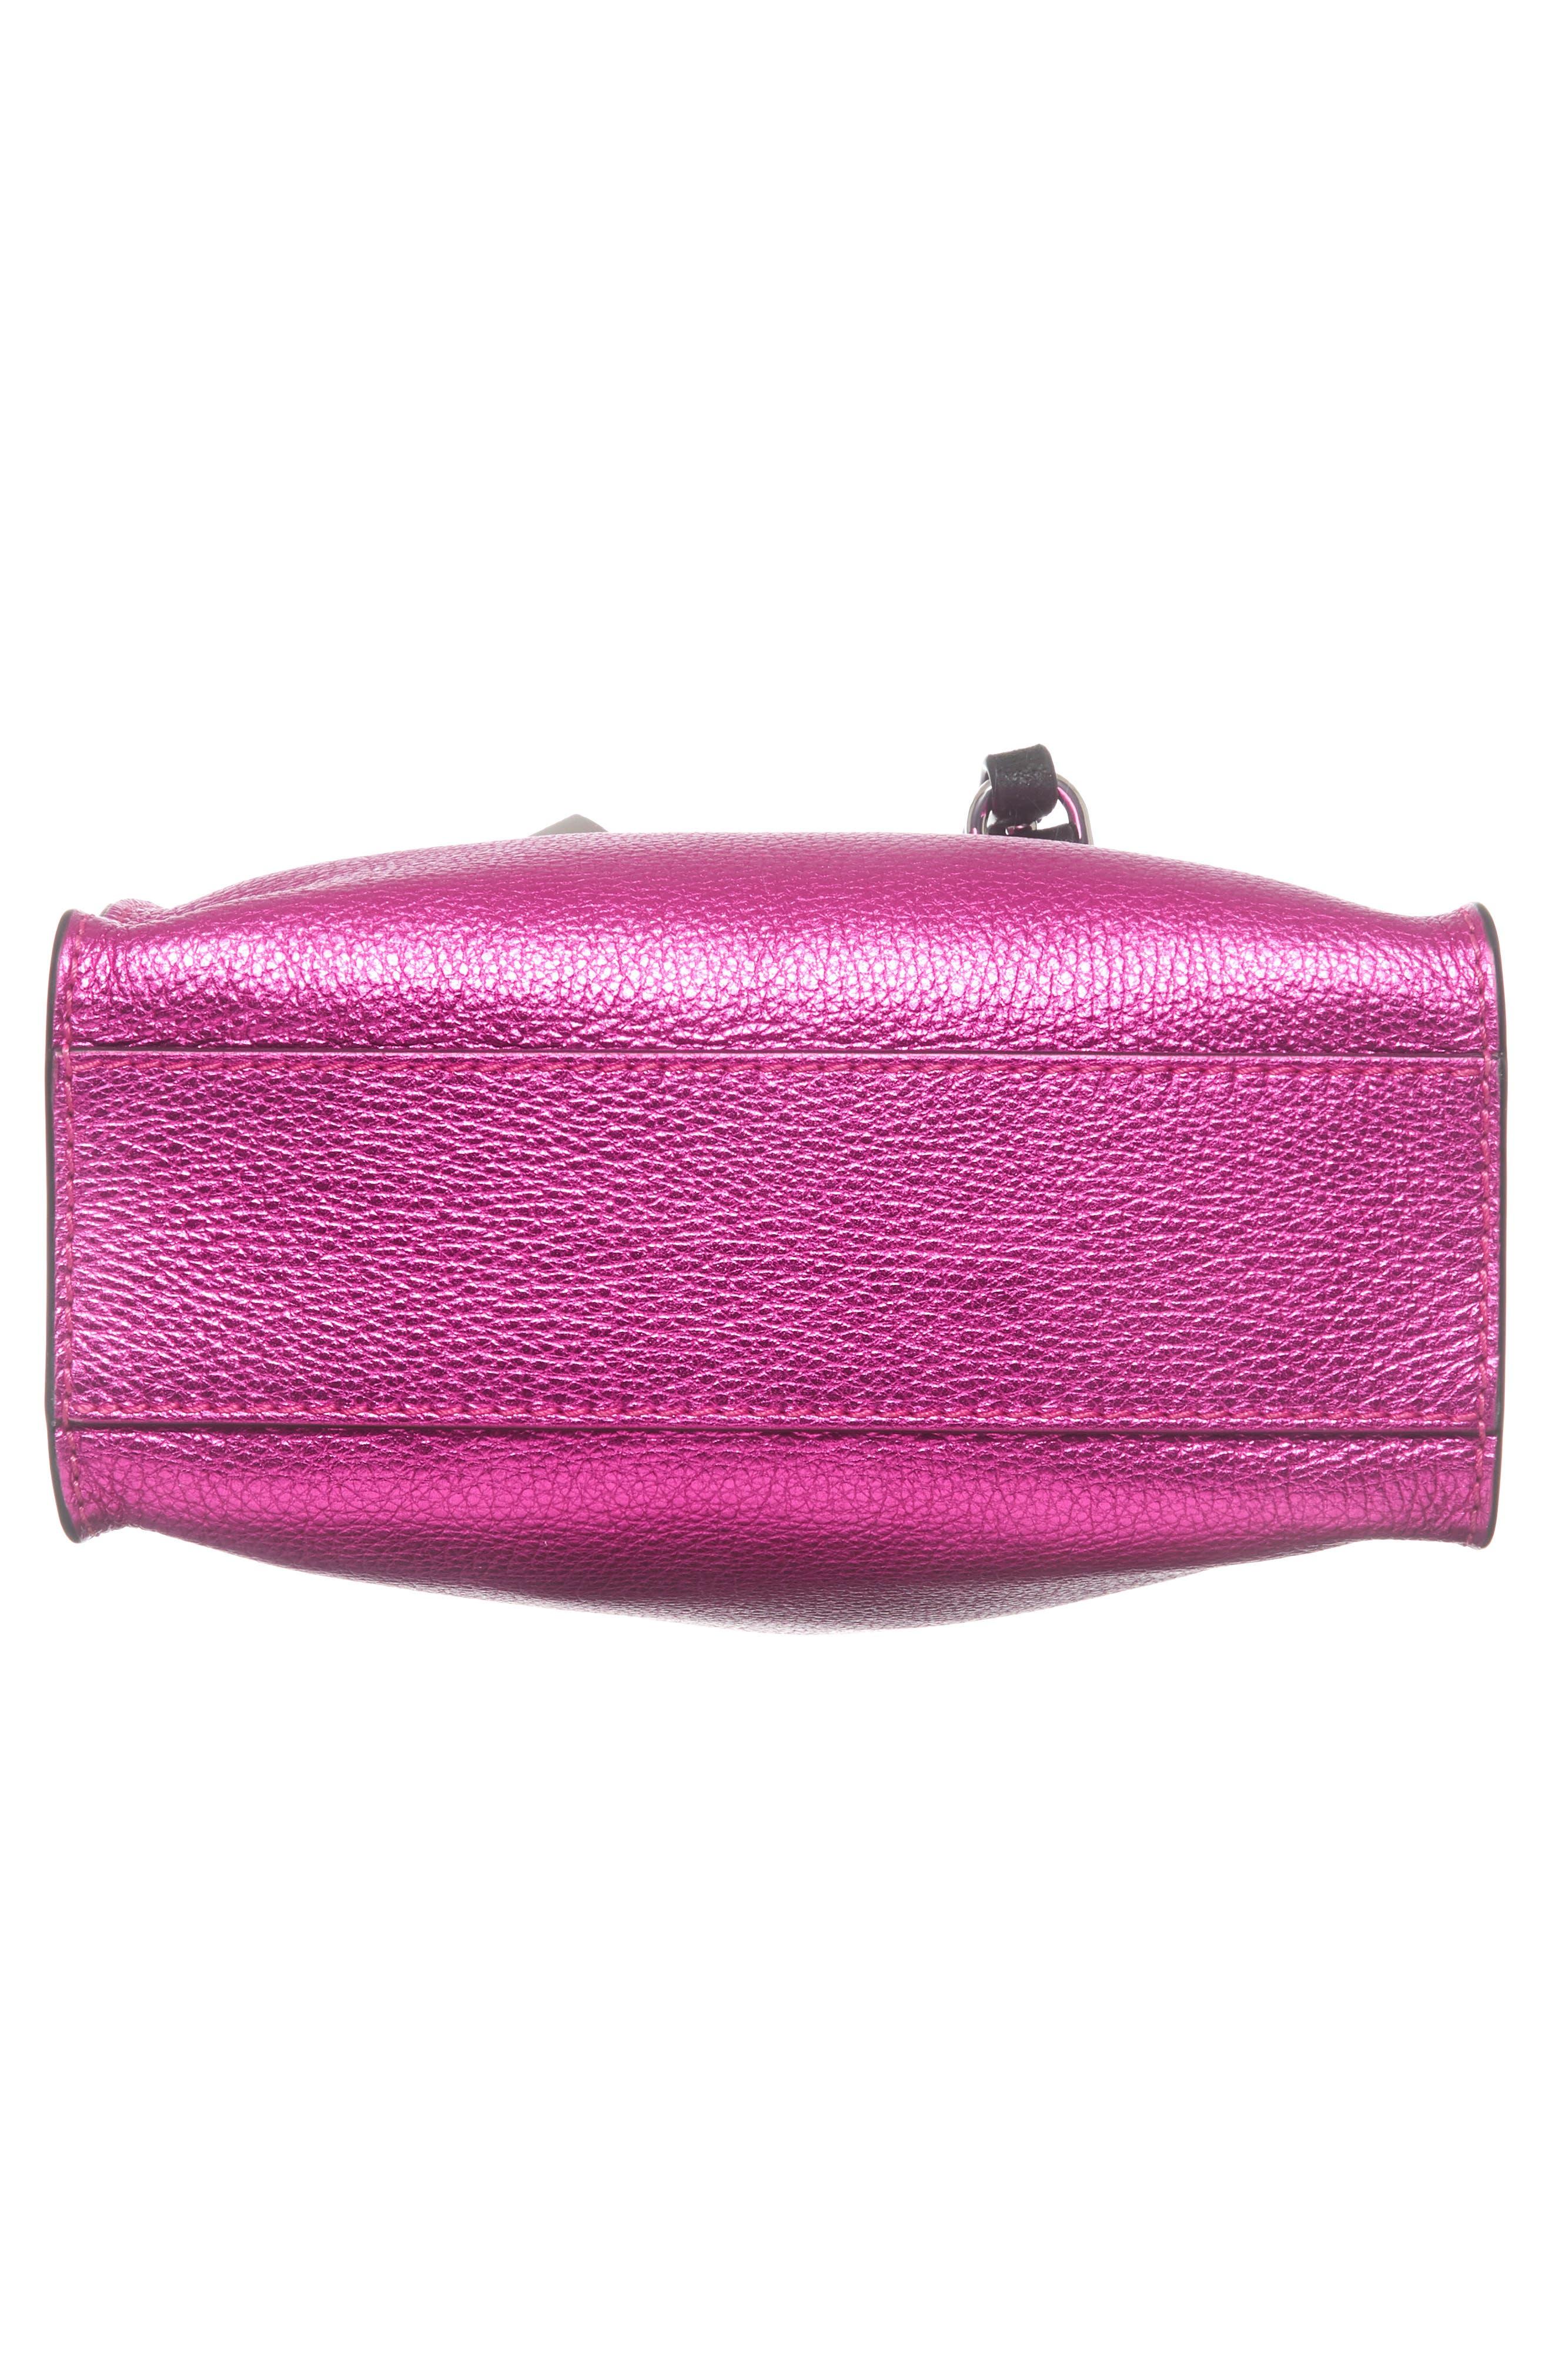 Mini The Grind Metallic Leather Tote,                             Alternate thumbnail 6, color,                             678